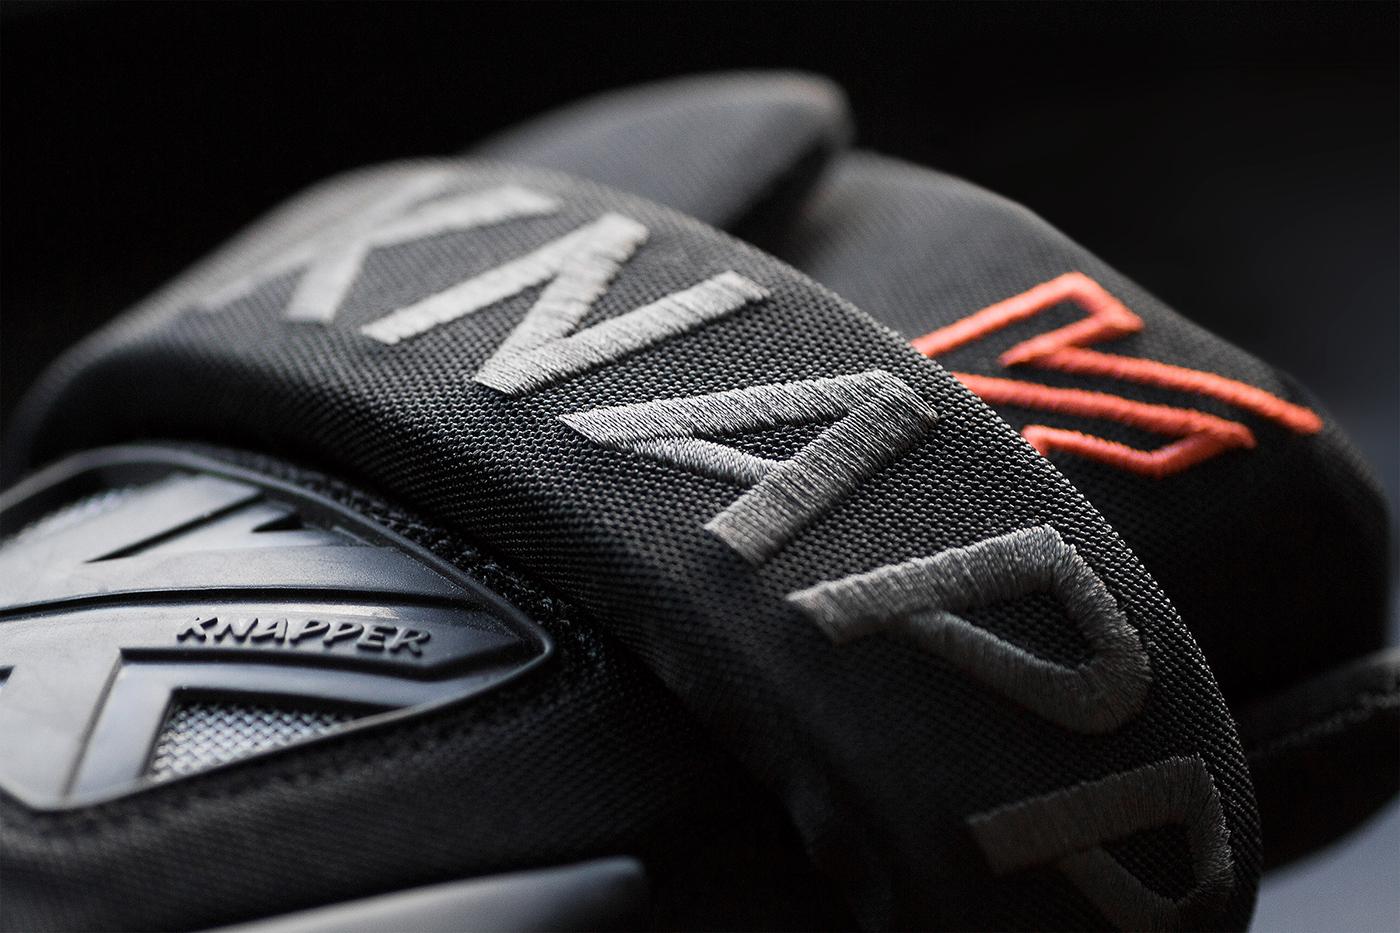 Knapper AK7 - hokejbalové rukavice